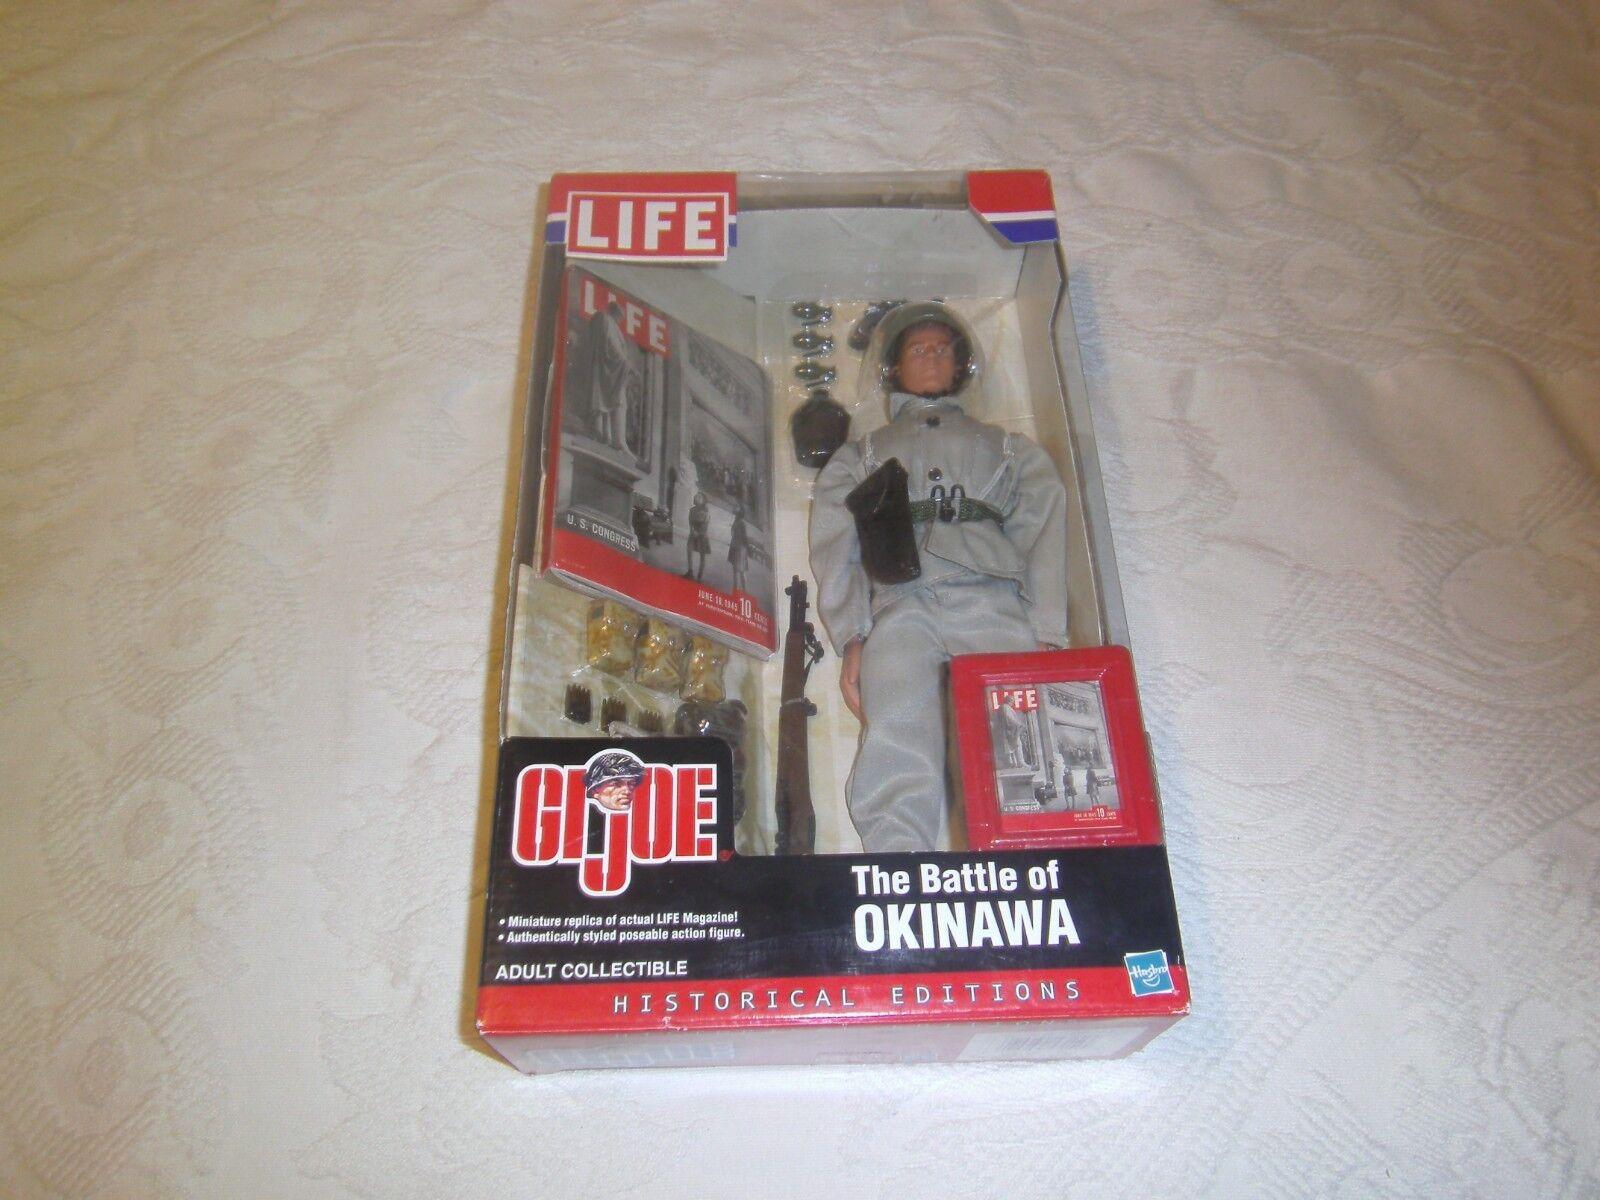 Vintage 12  GI Joe battle of Okinawa 2002 action figure Life Historical Editions